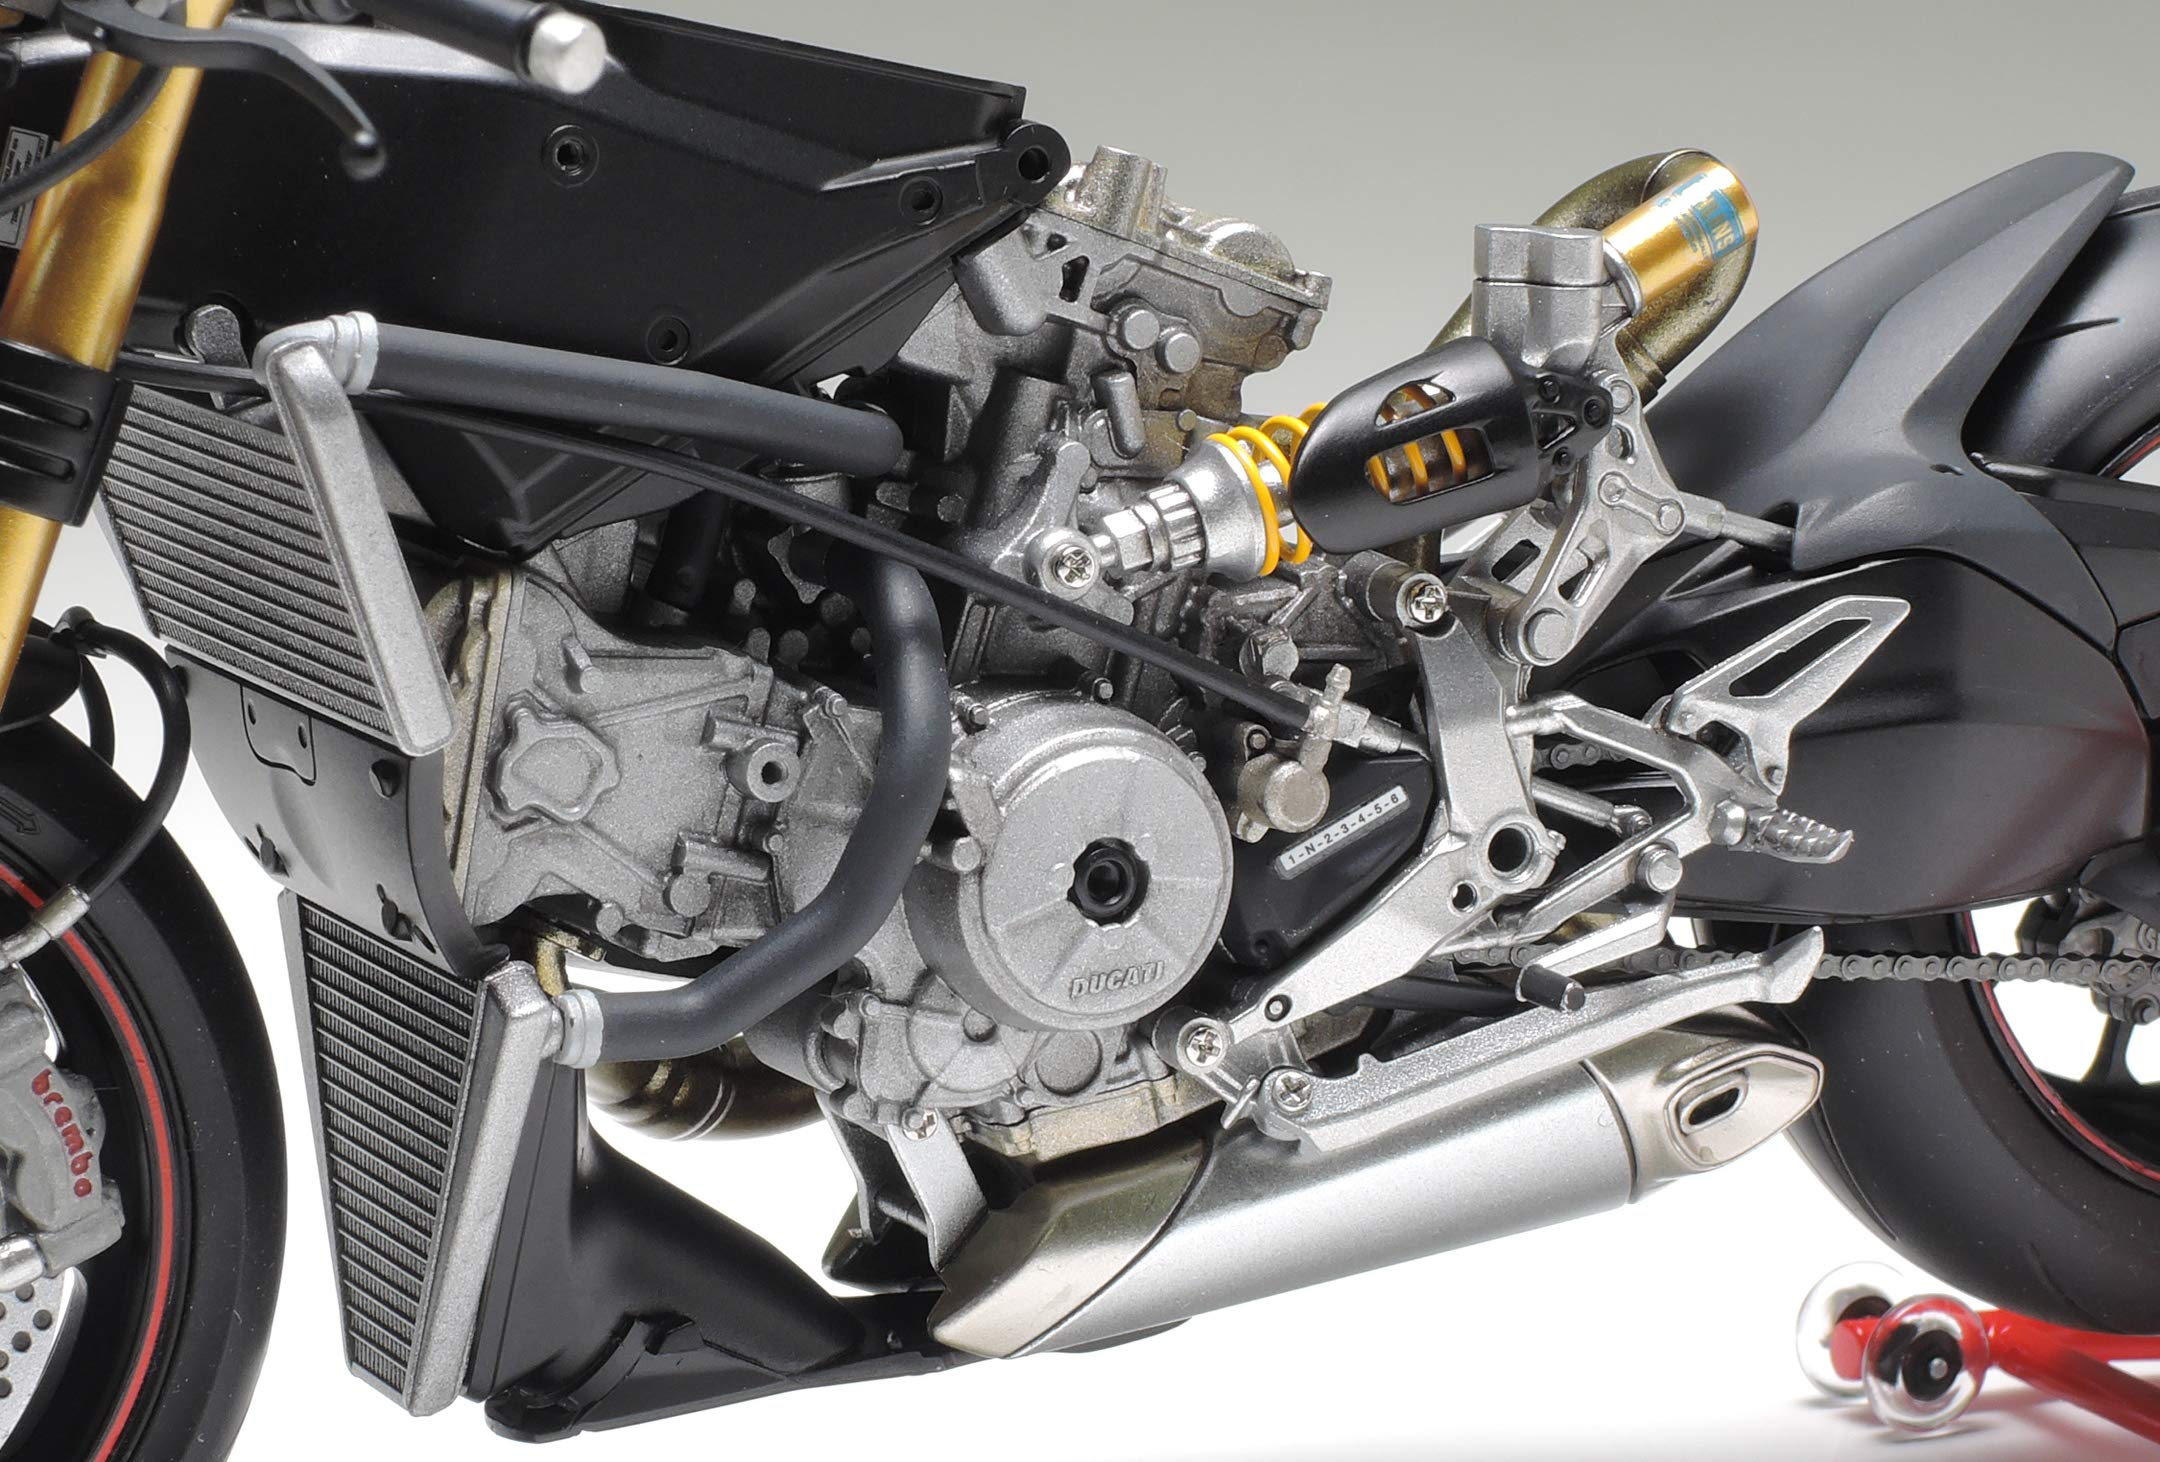 Tamiya 14129 1:12 Ducati 1199 Panigale S Model 9